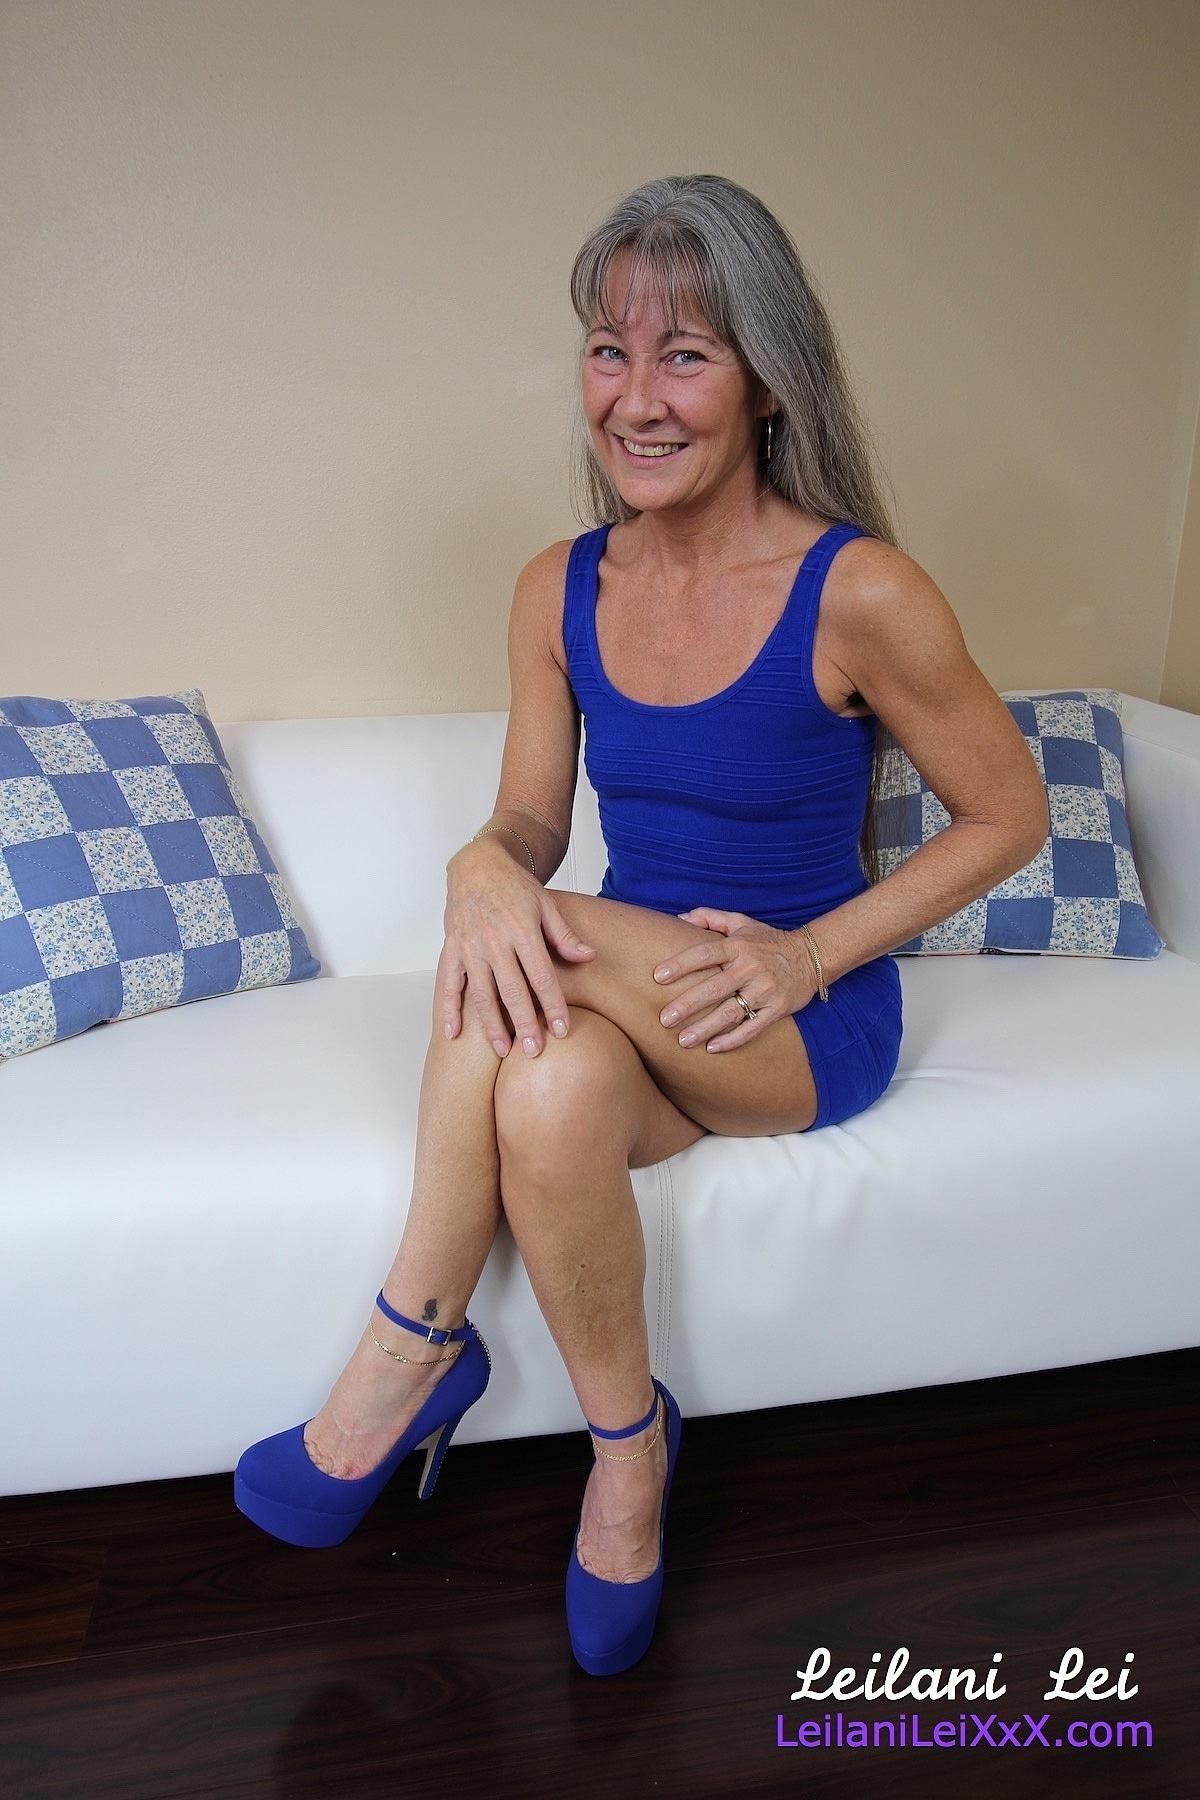 Leilani lei gives jason a foot job - 3 part 3